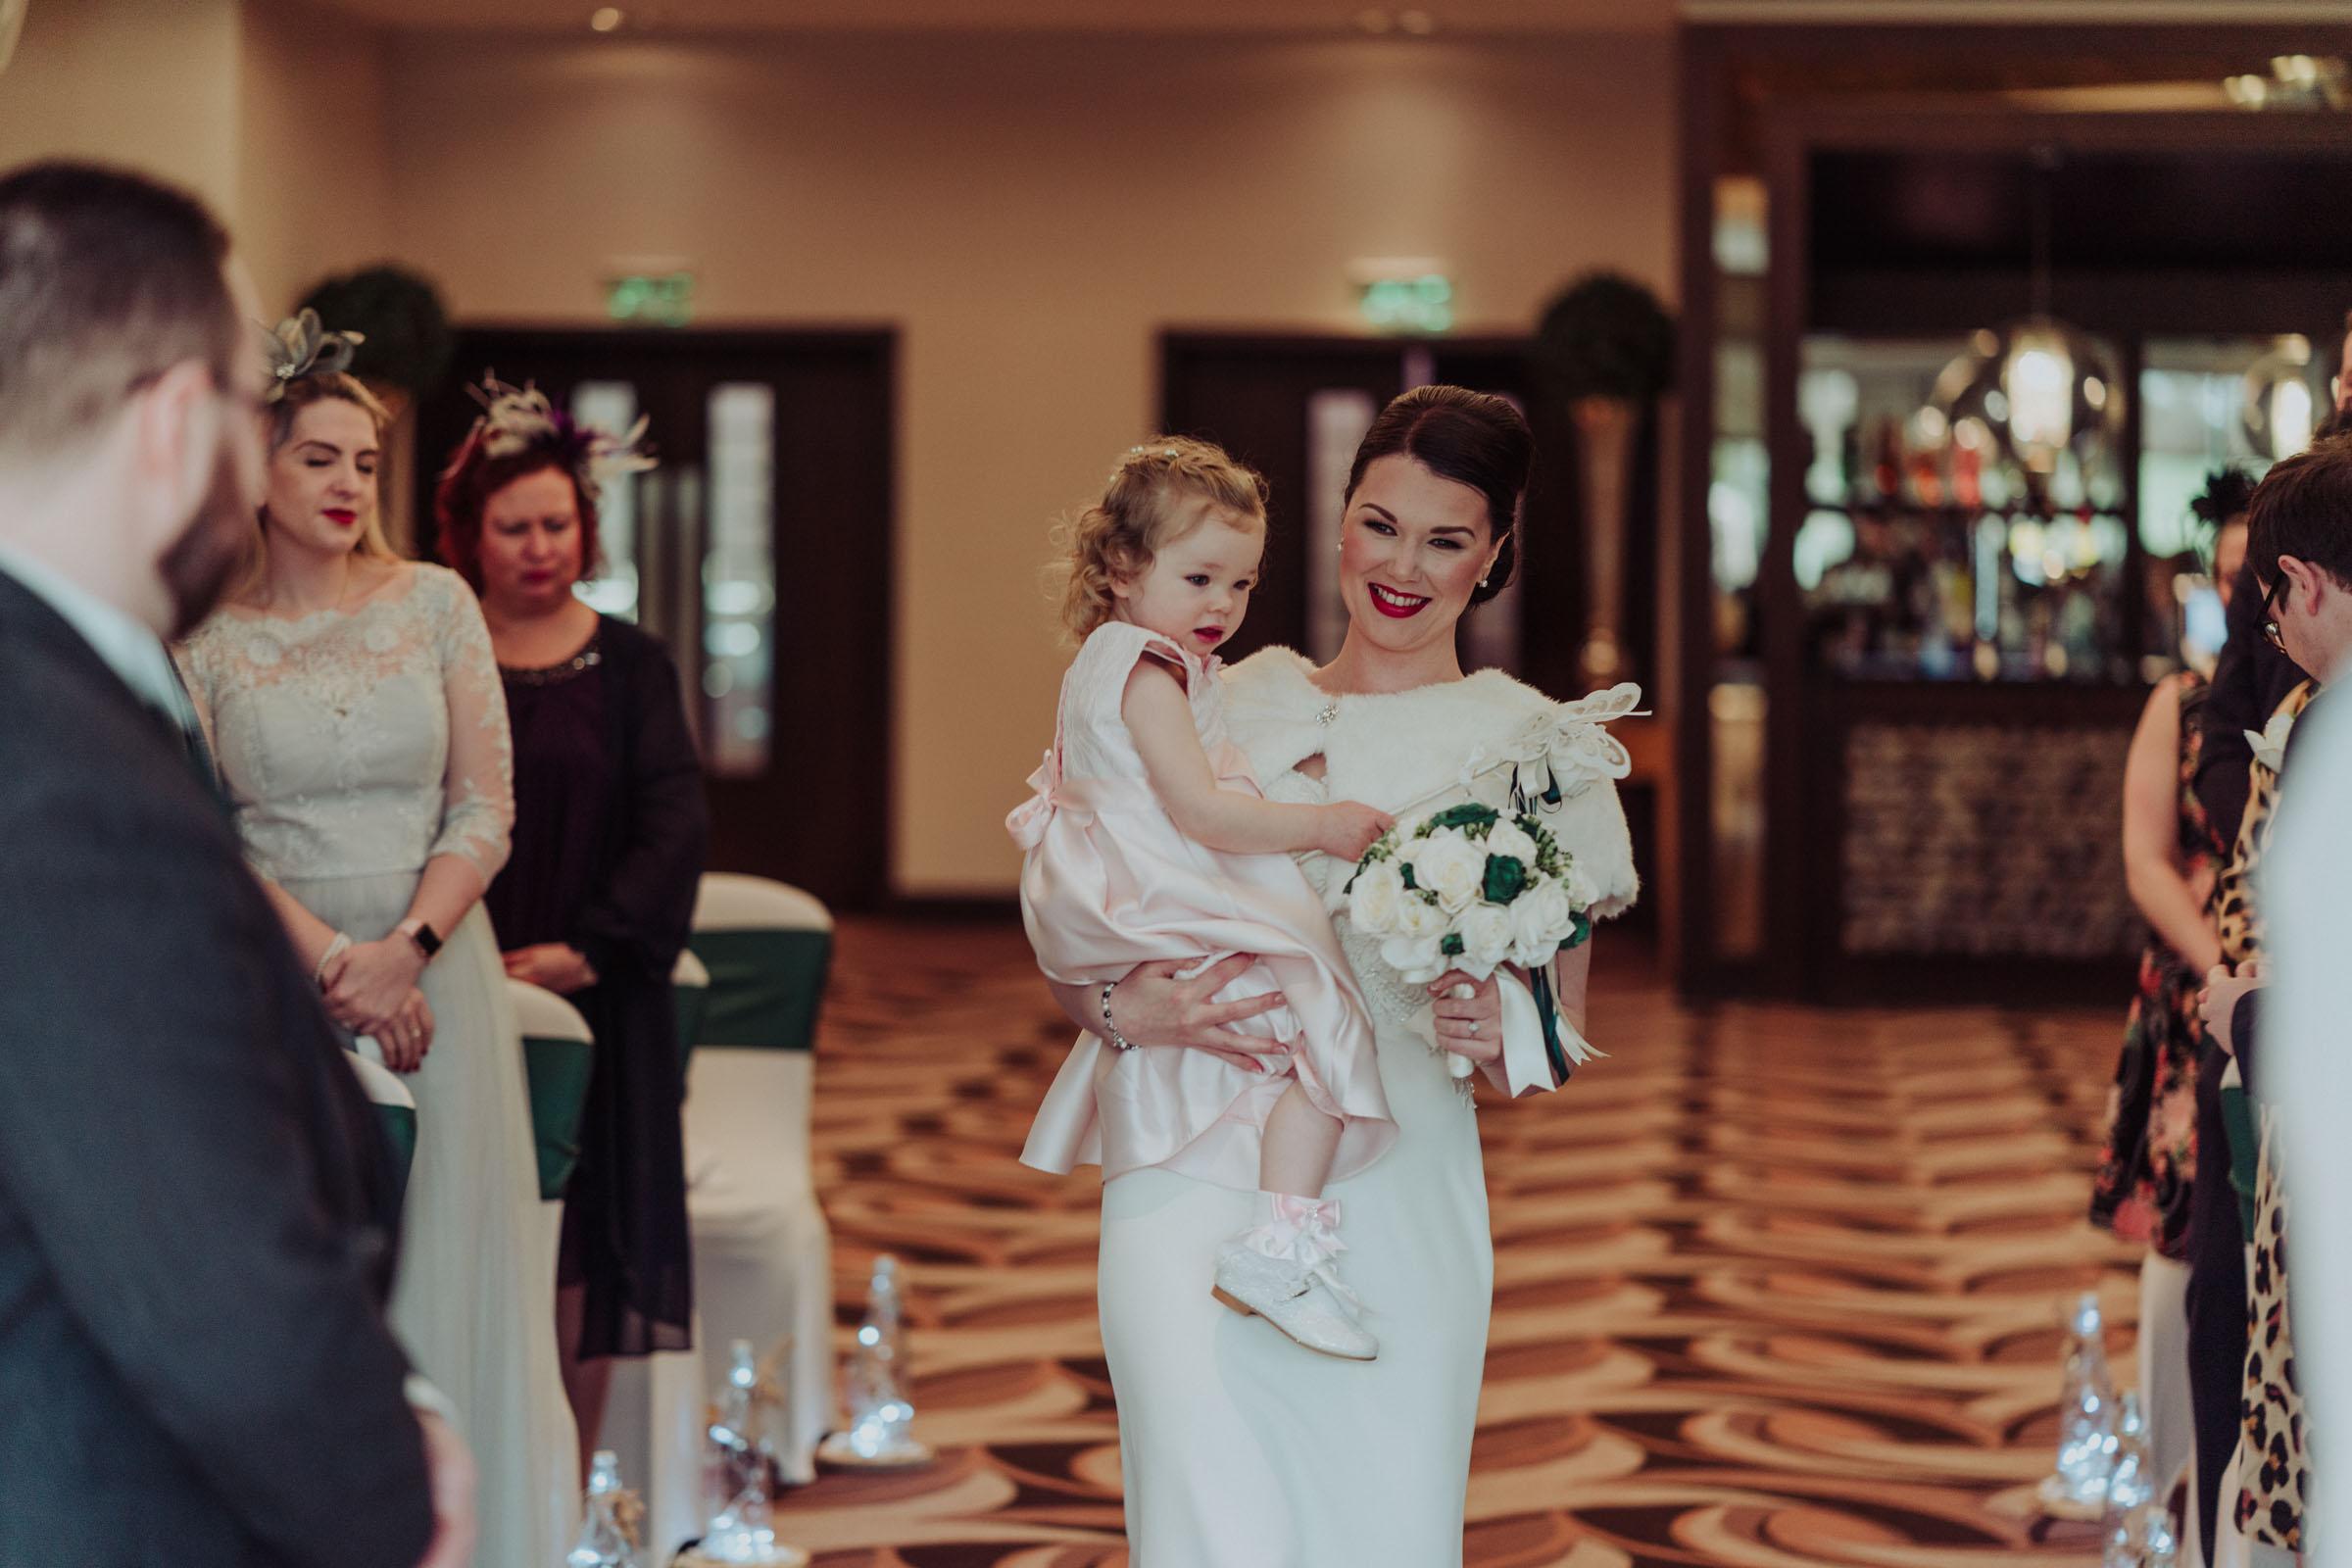 Radstone-Wedding-Dearly-Photography-Scotland (11 of 50).jpg